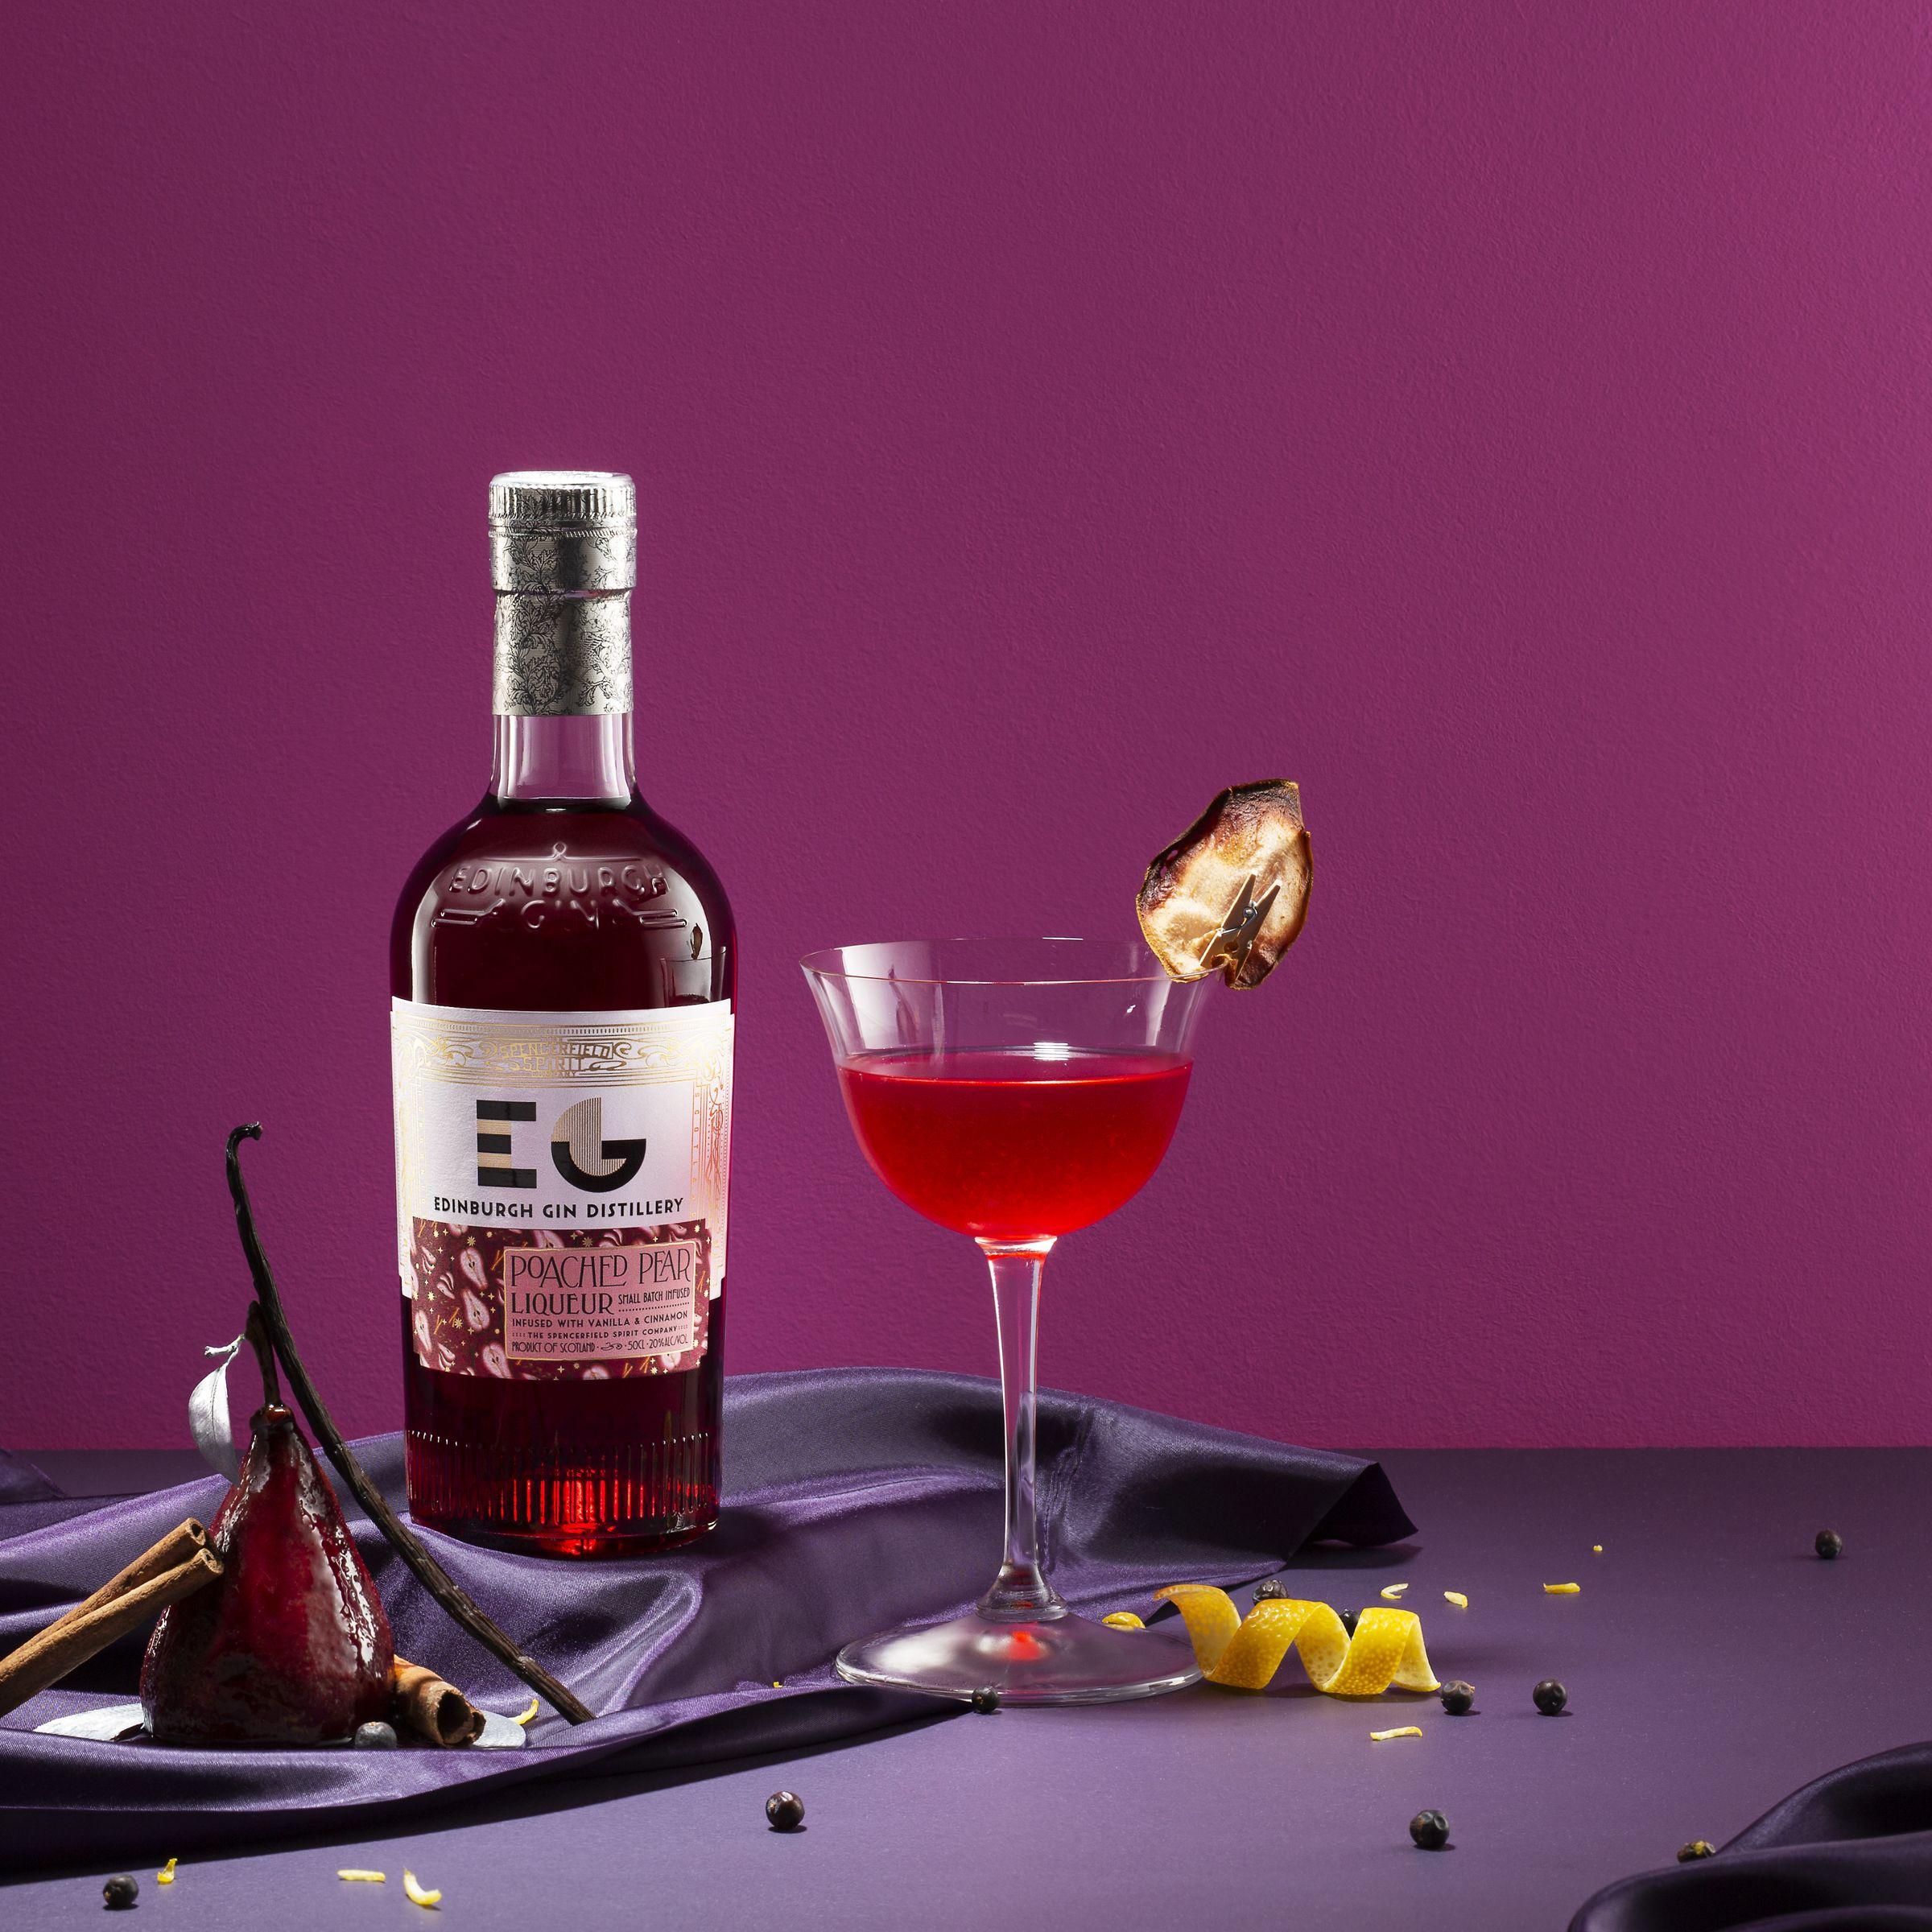 Enjoy Edinburgh Gin's new Poached Pear gin liqueur this Christmas | Good house keeping